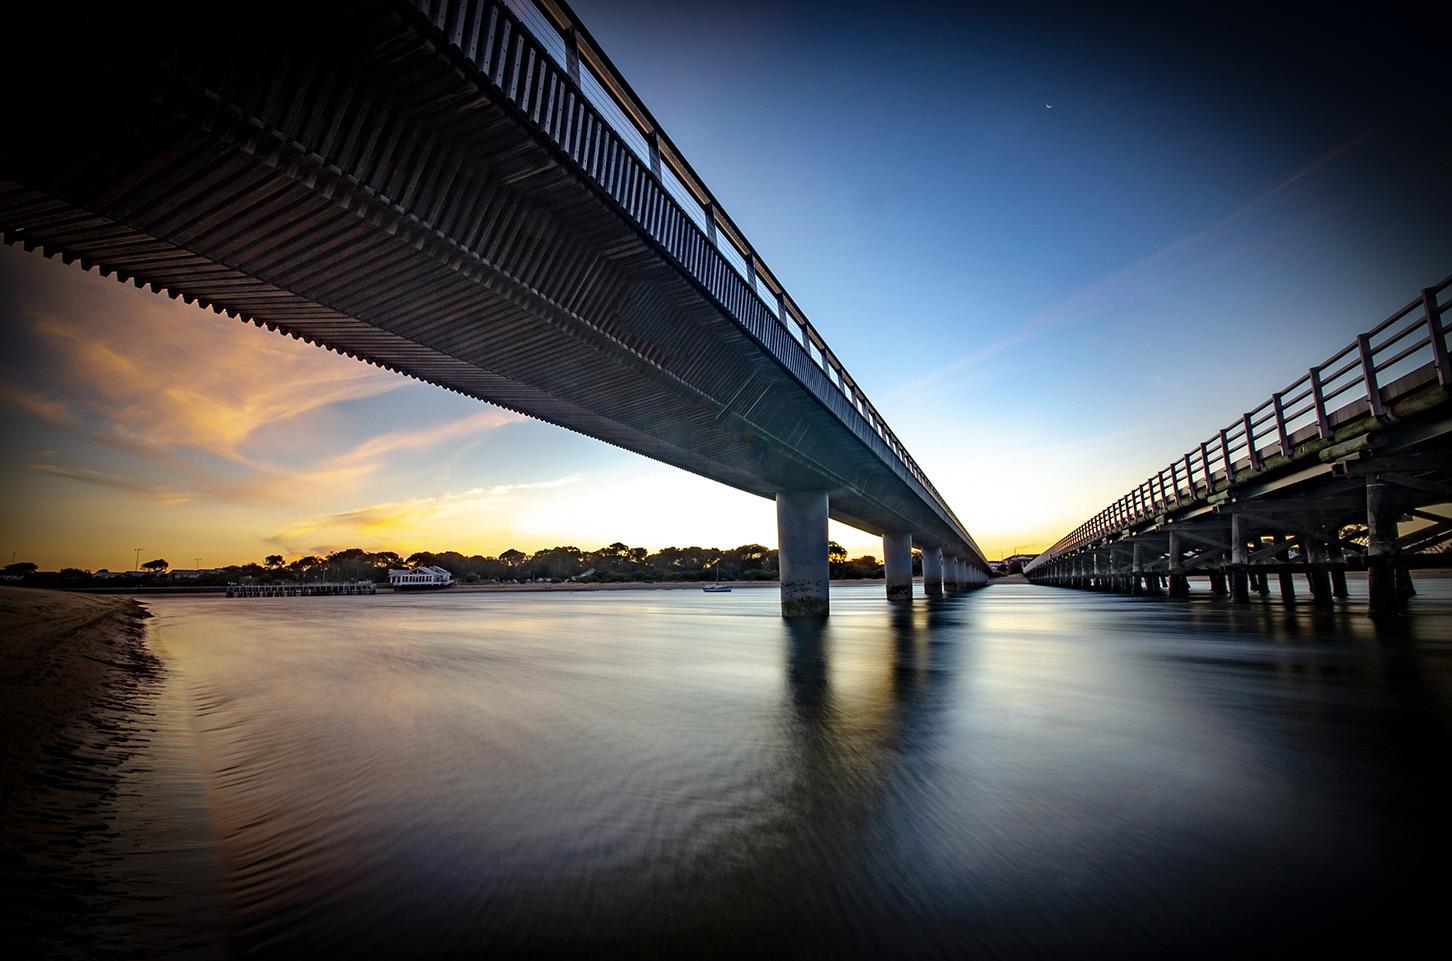 BH Sunset Bridge